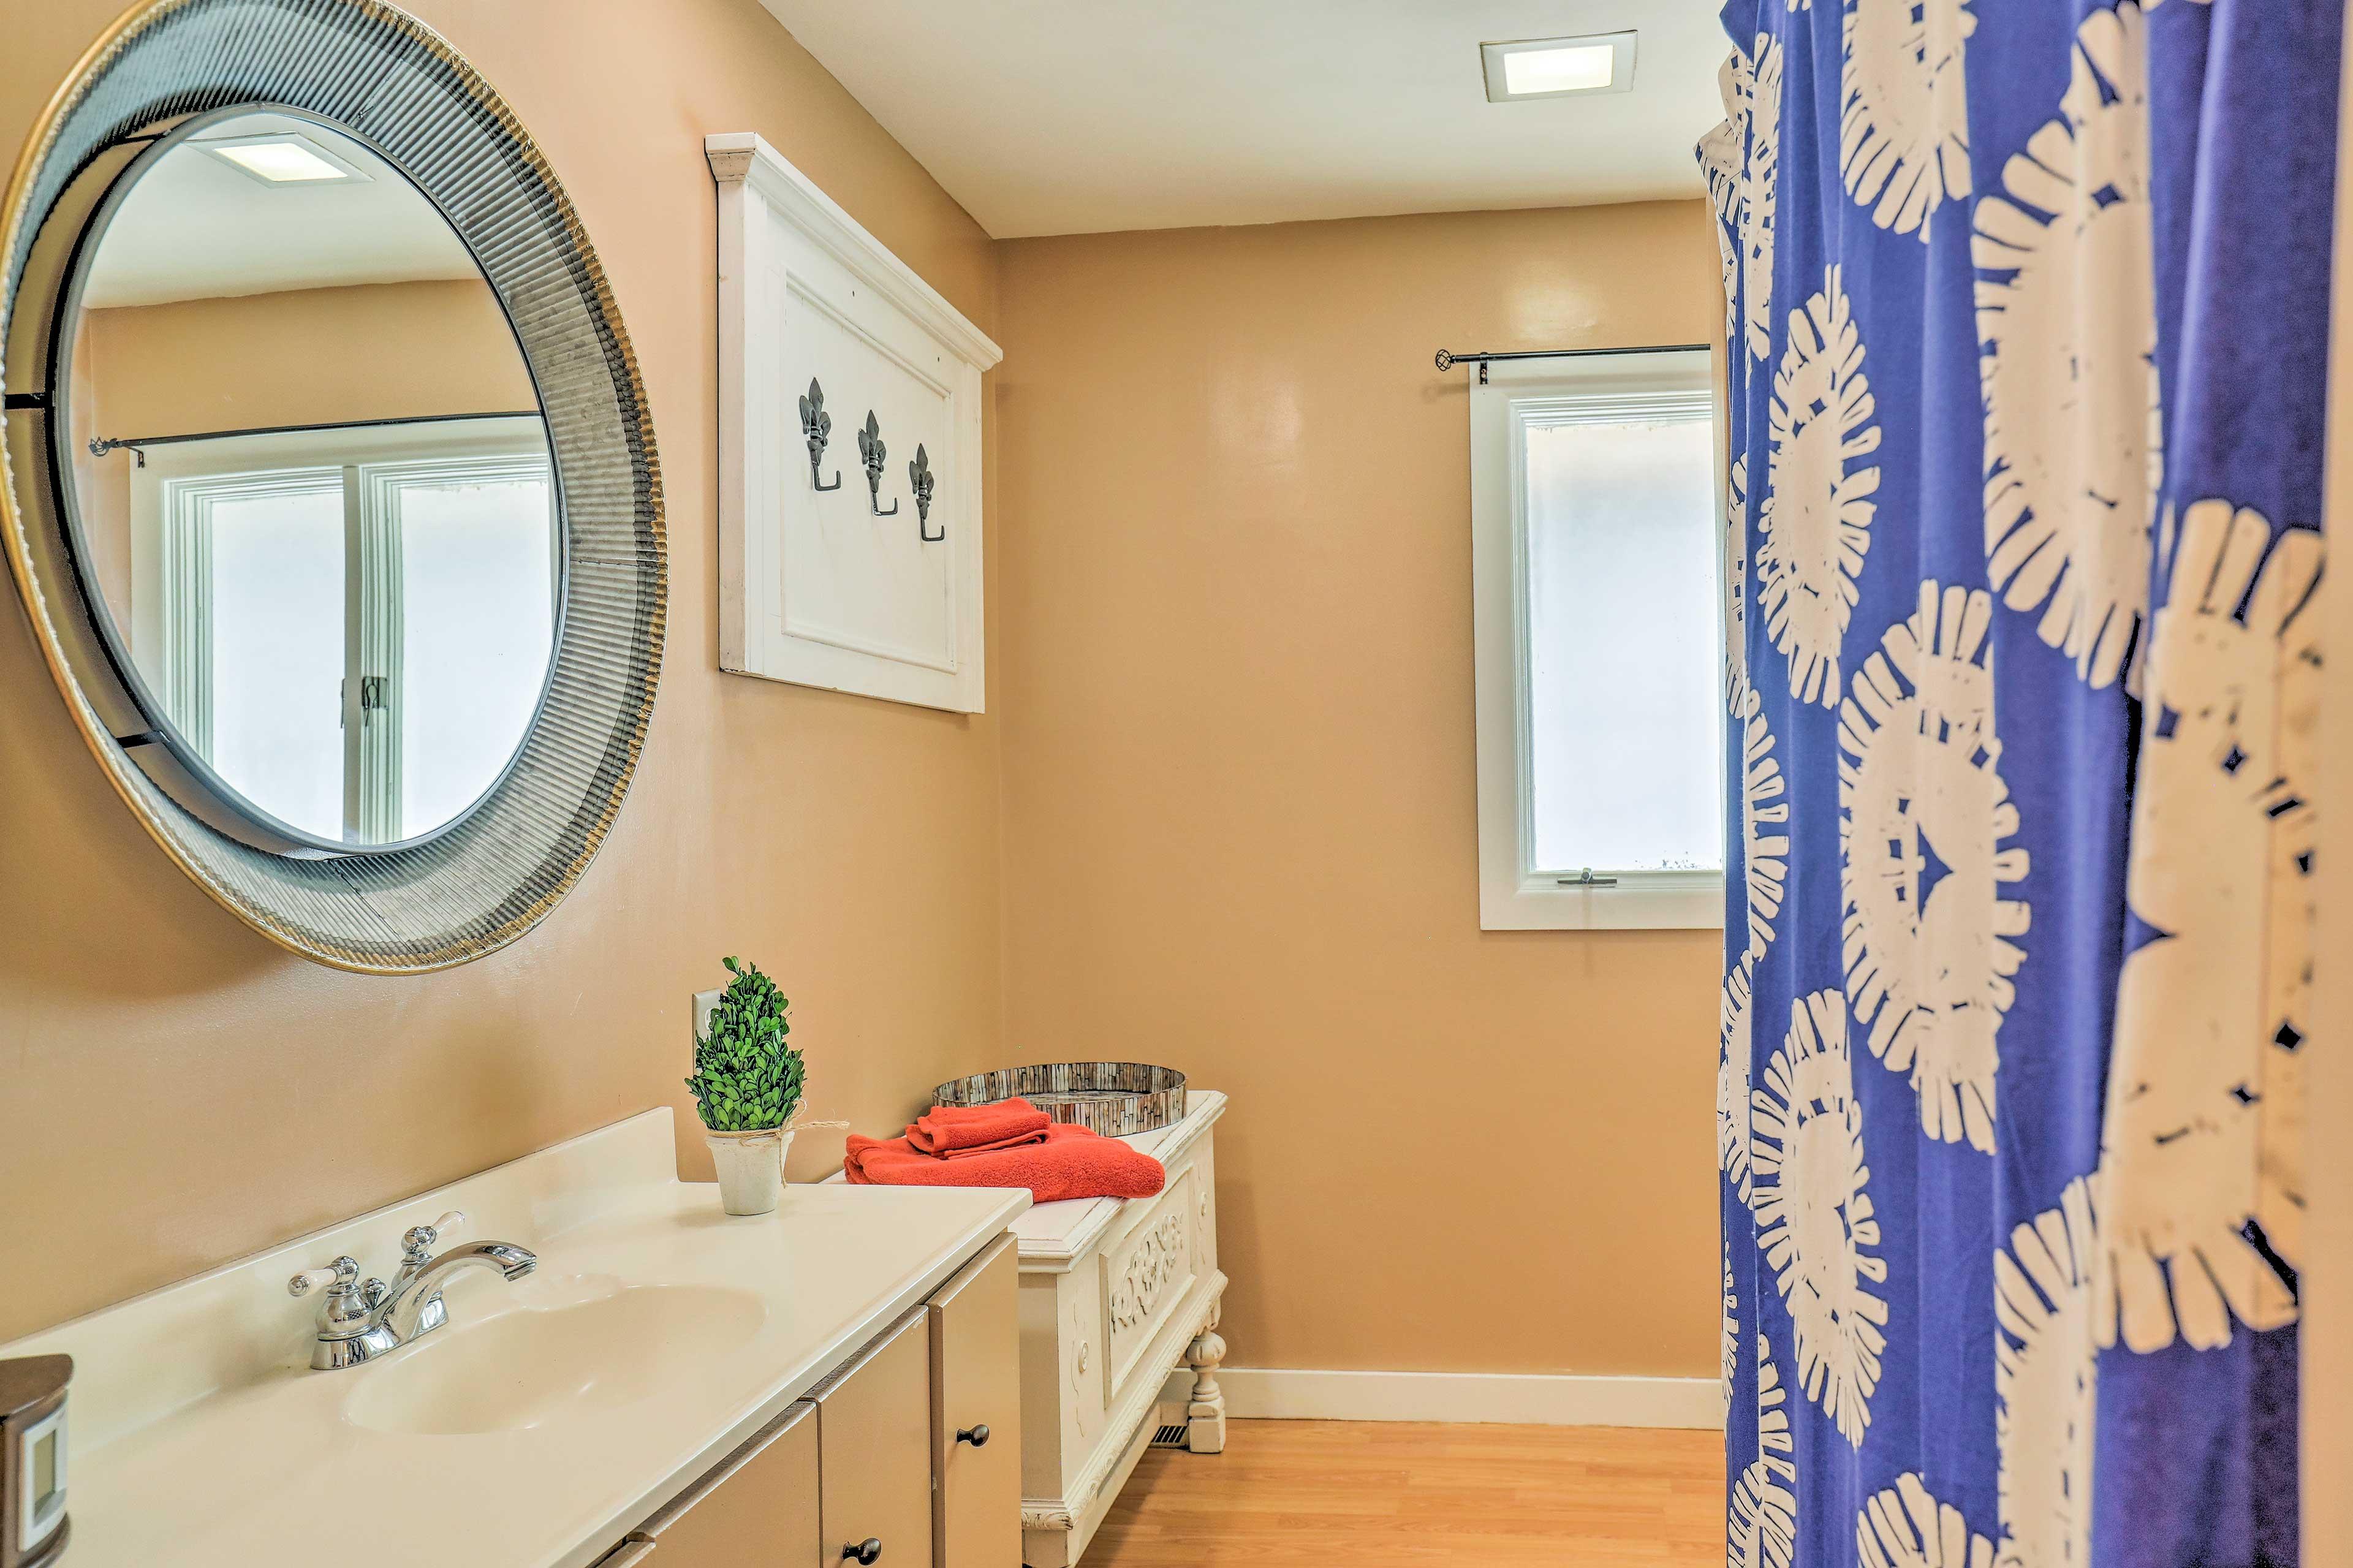 A circular mirror and quirky decor furnish this full bathroom.